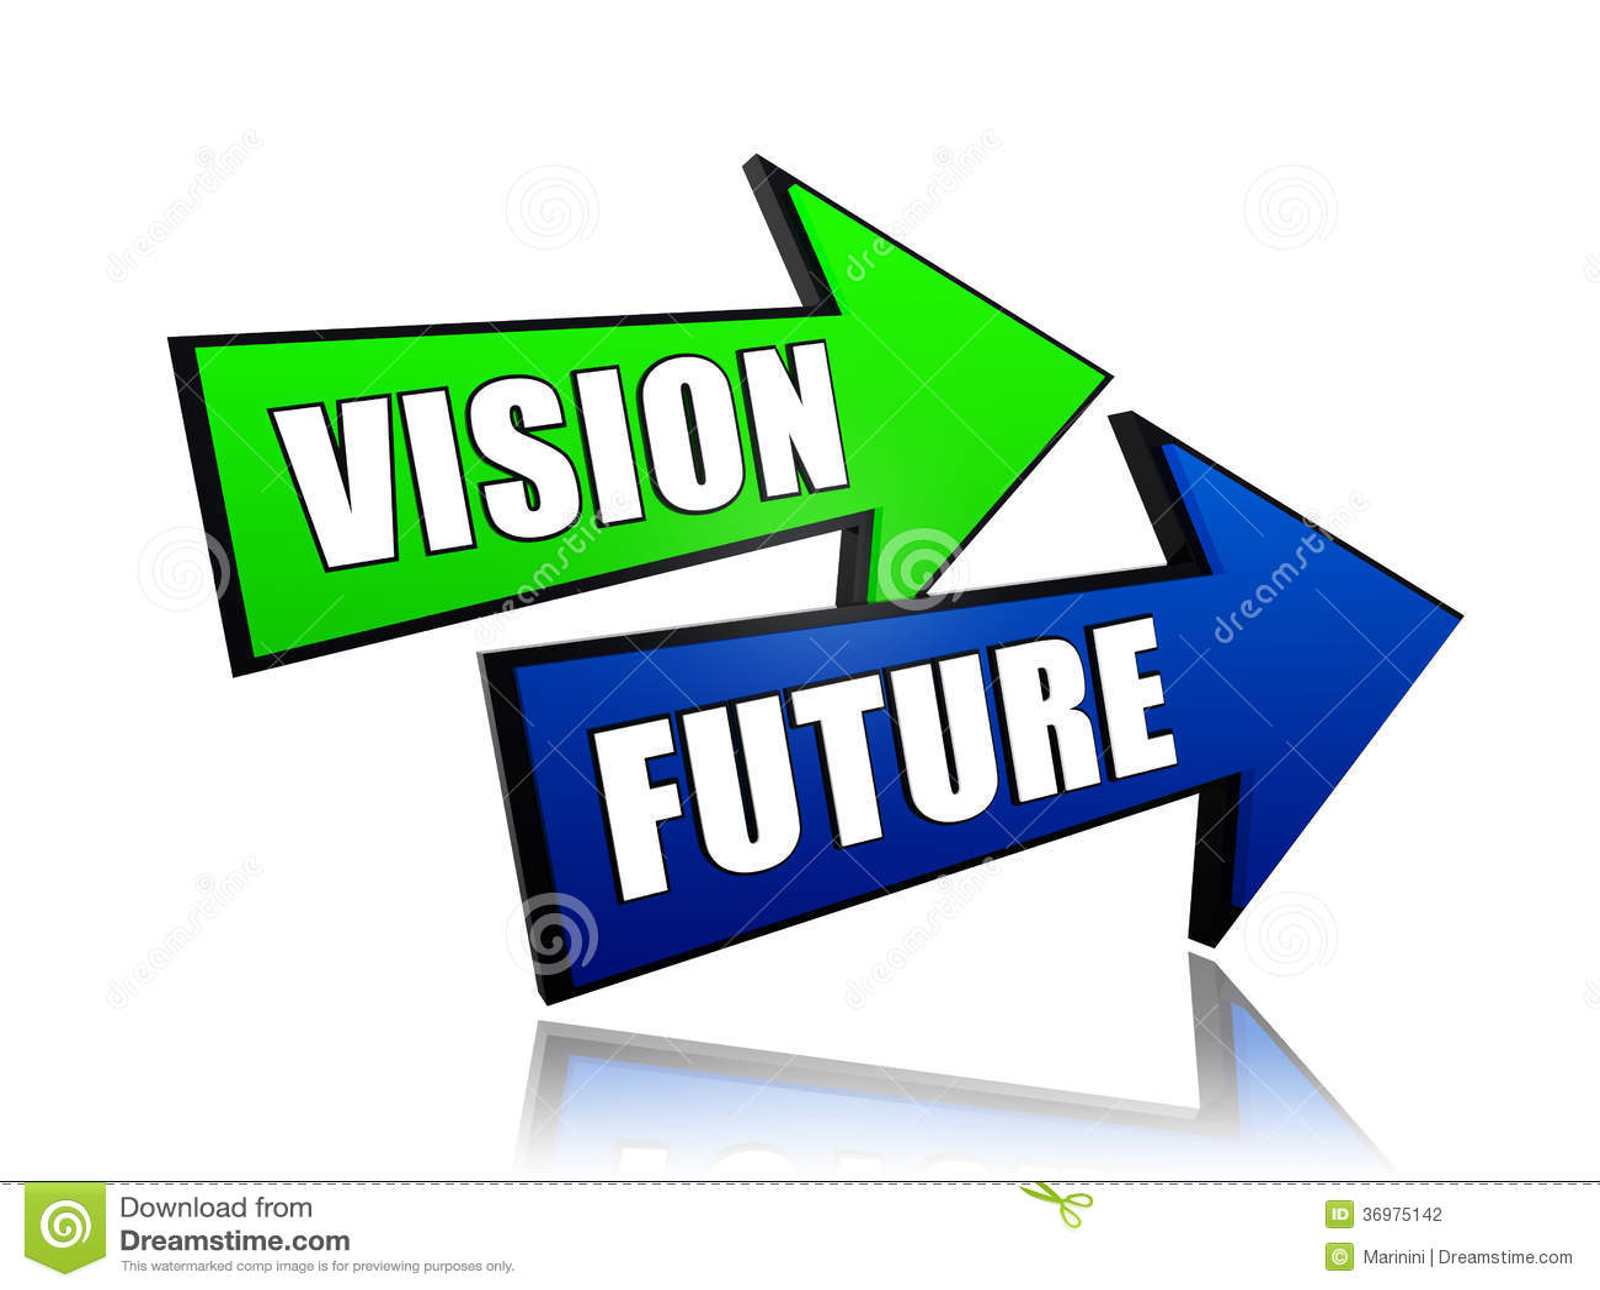 vision future in arrows stock illustration illustration of ambition rh dreamstime com vision clip art free vision clip art images